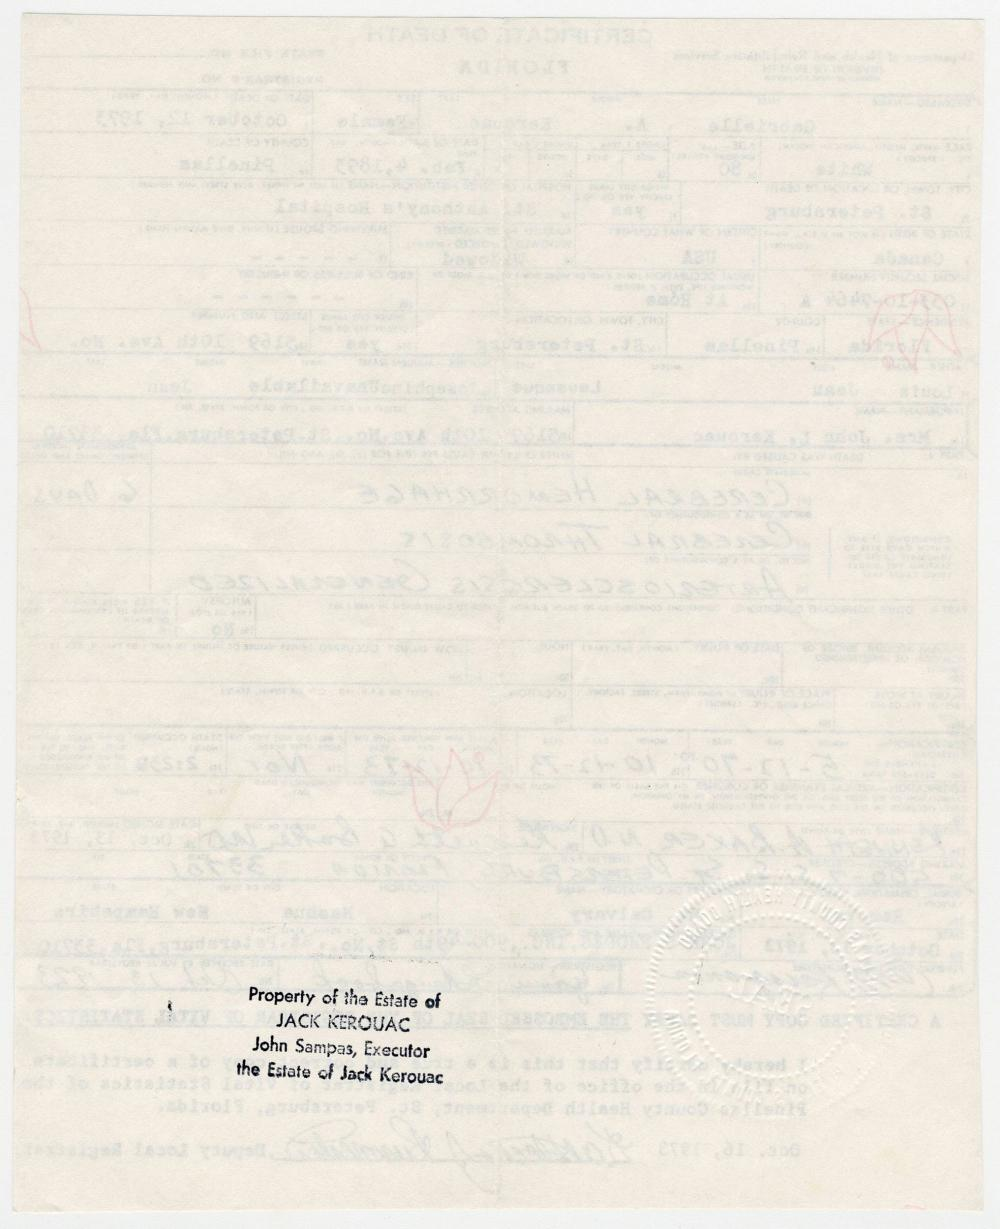 Jack Kerouac's Mother's Embossed Death Certificate, Estate-Owned